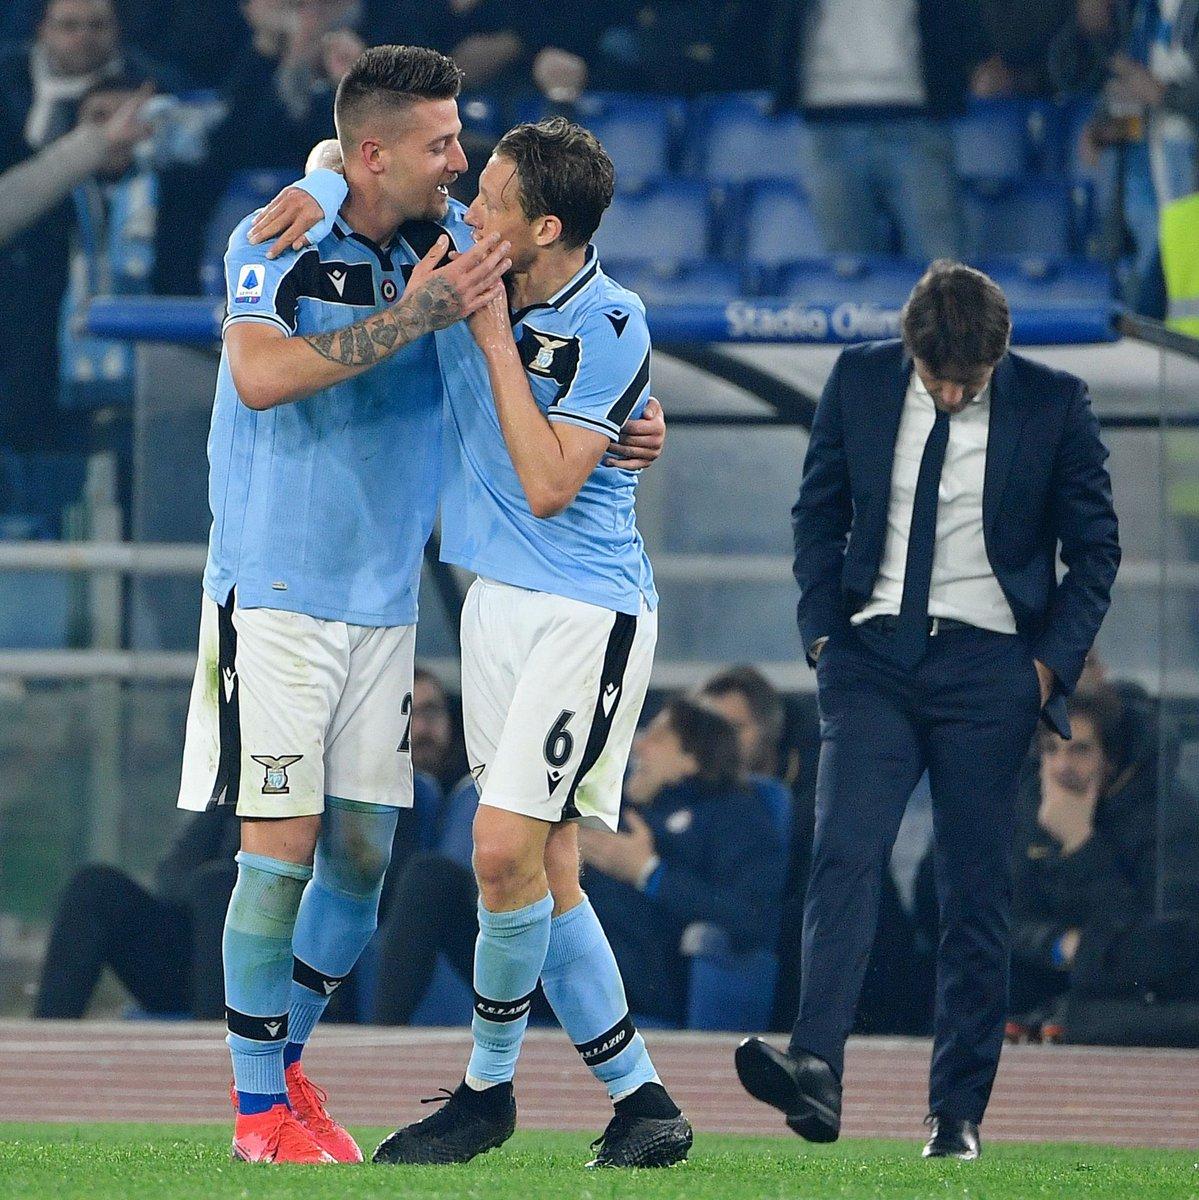 Juventus   57 poin  Lazio   56 poin  Inter   54 poin  Perburuan titel Serie A semakin ketat! <br>http://pic.twitter.com/JUl16H02V8